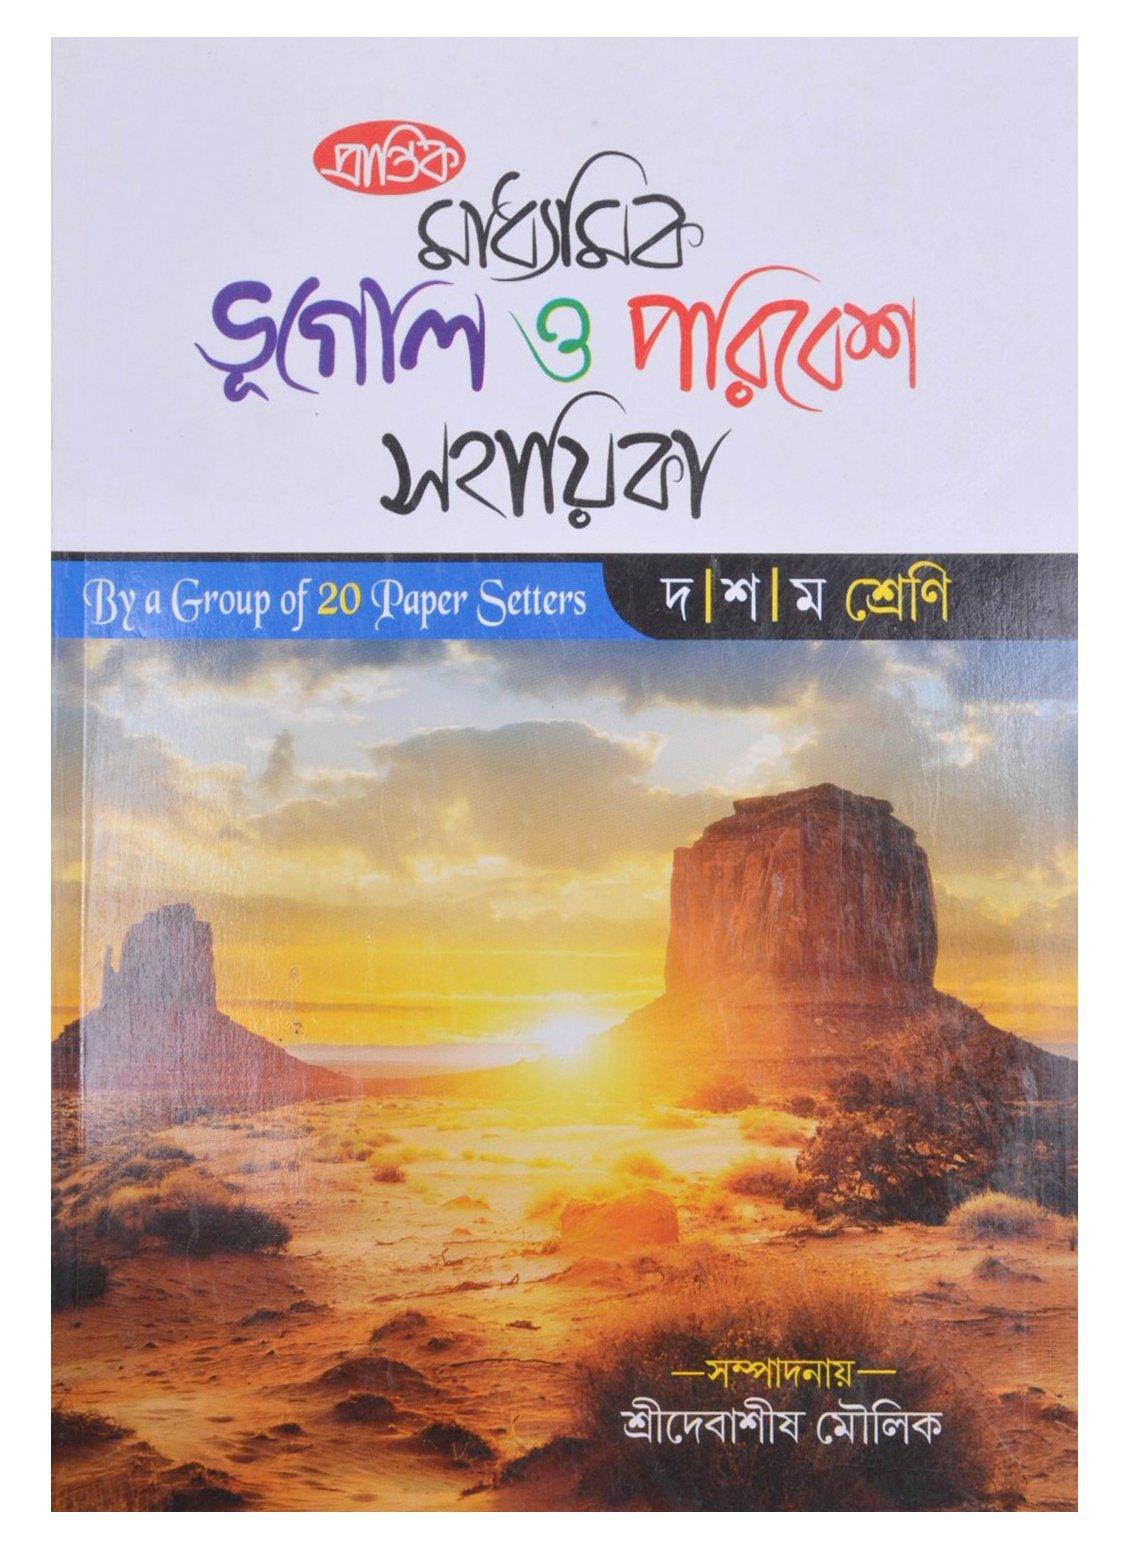 Madhyamik Bhugol Paribesh Sahayika For Class 10 Bengali Amazon In Debashish Moulick Books